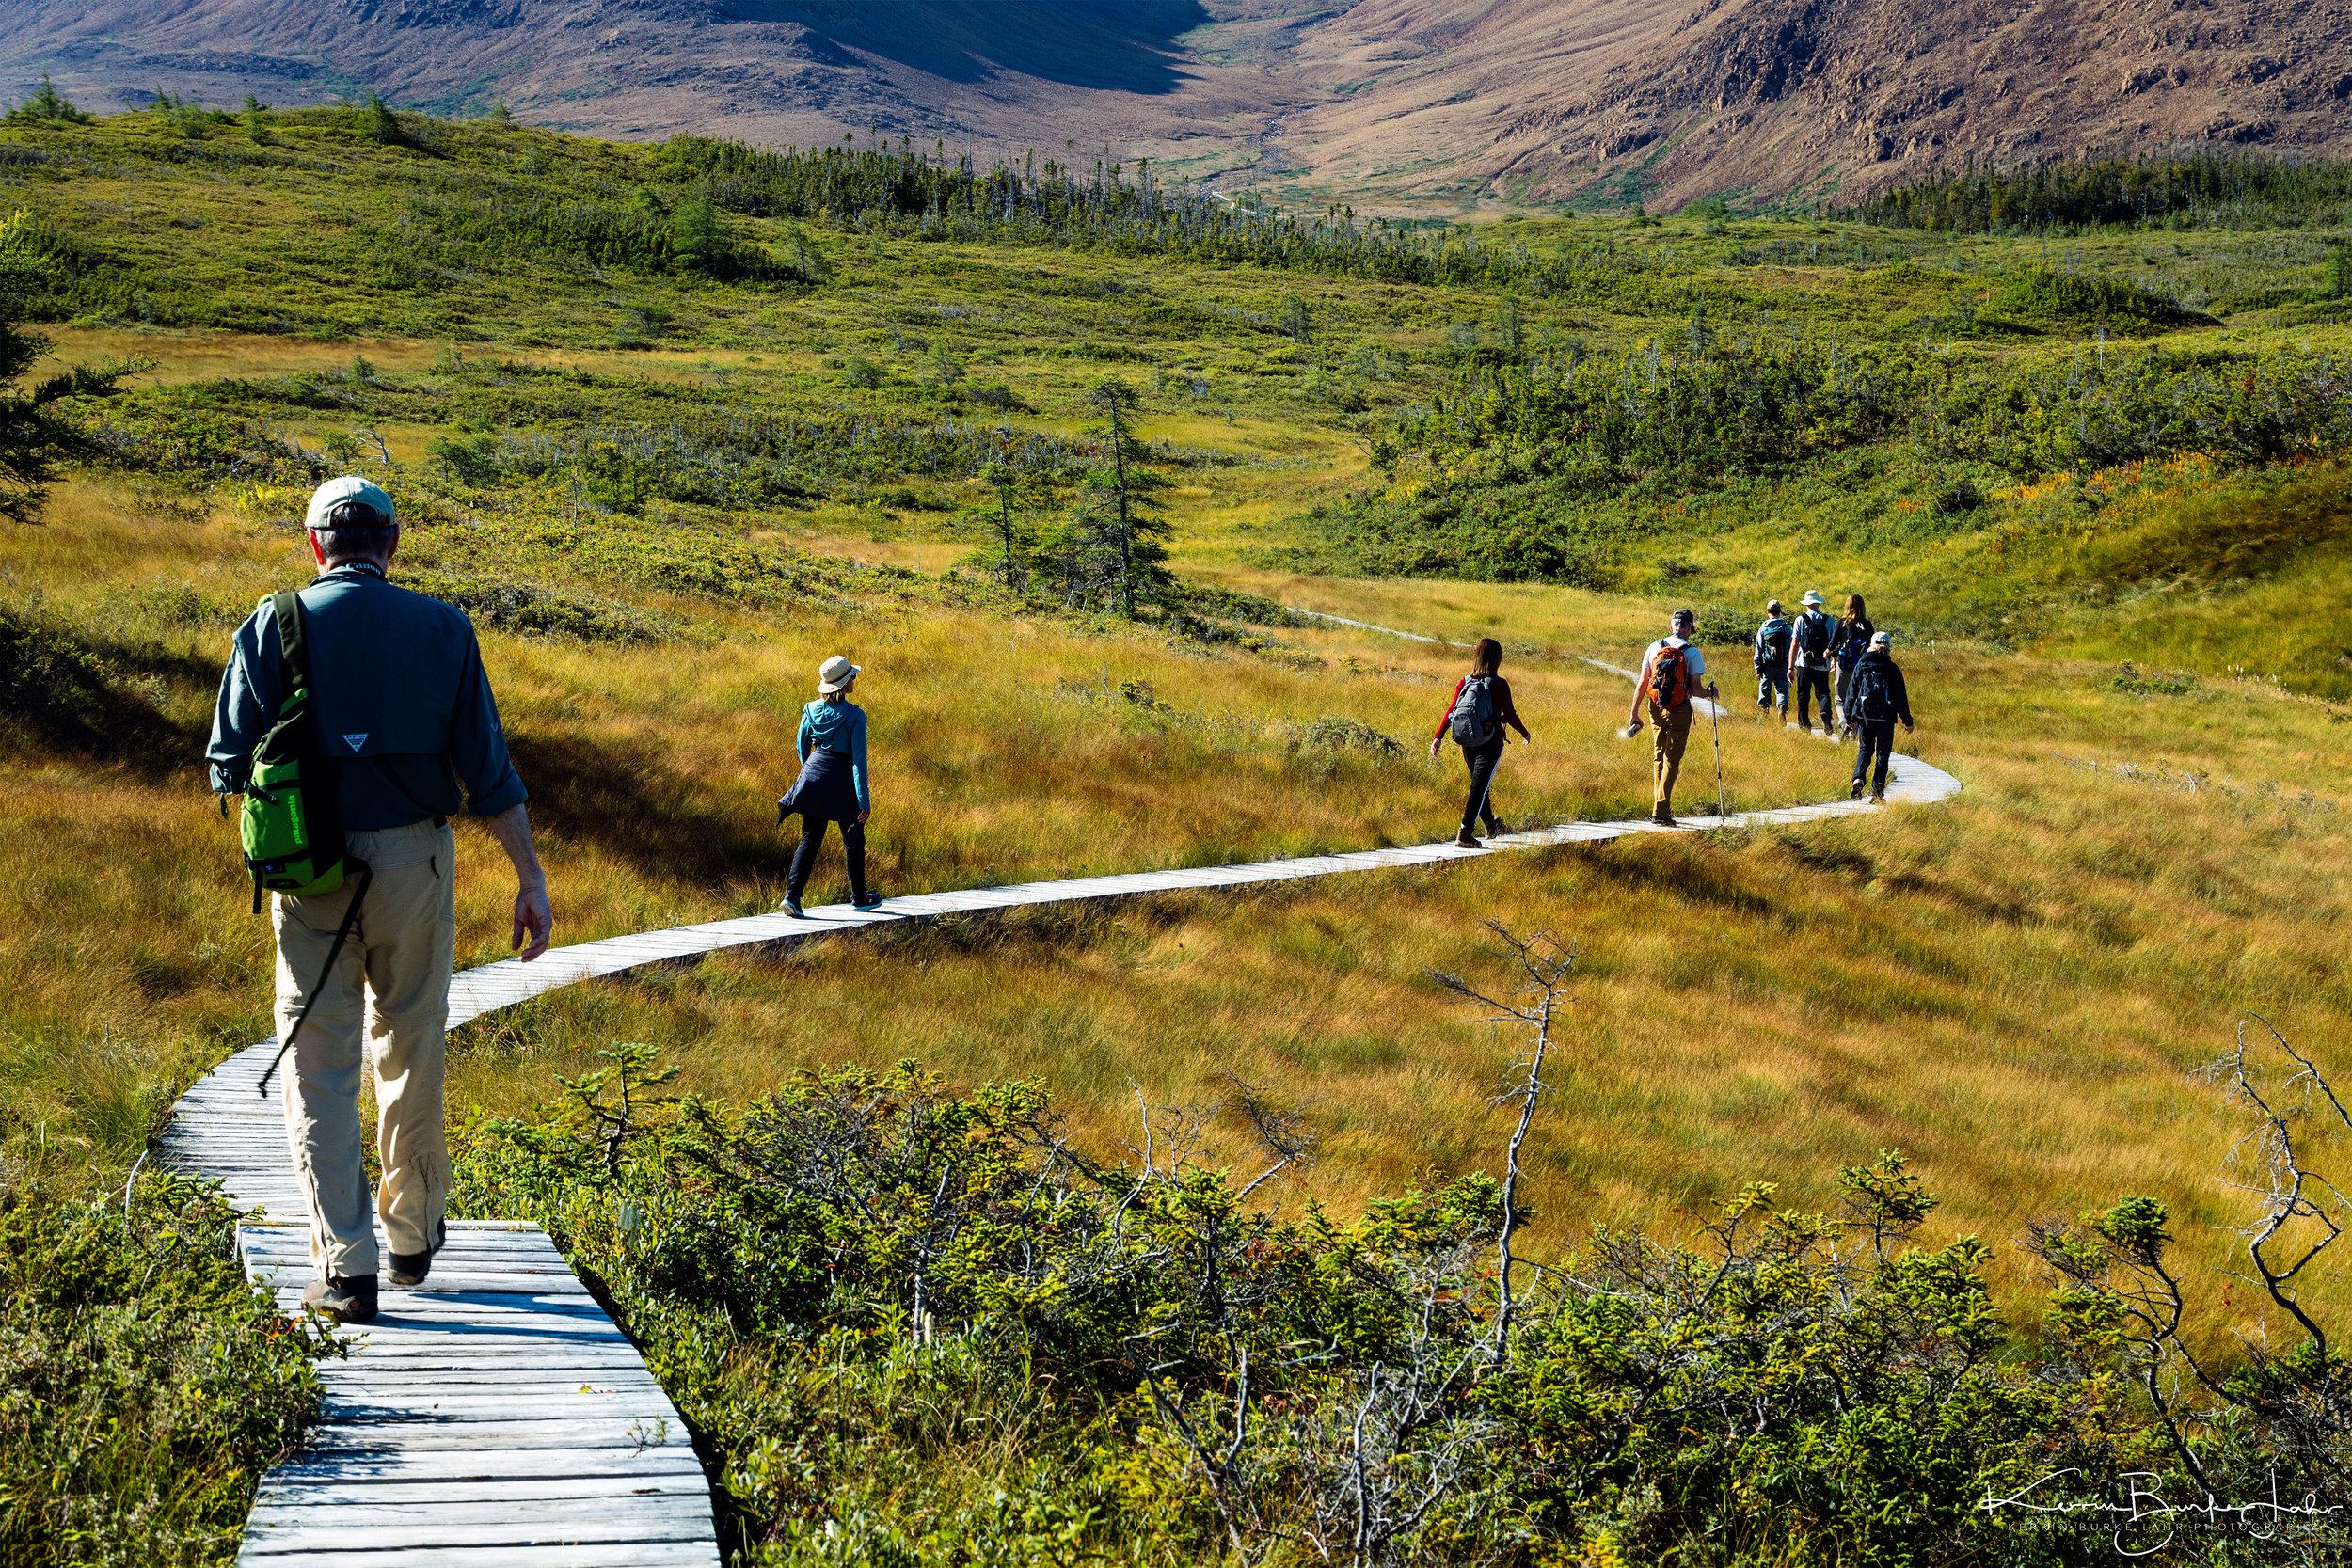 Gros-Morne-National-Park-Newfoundland-9-18-2017-40.jpg